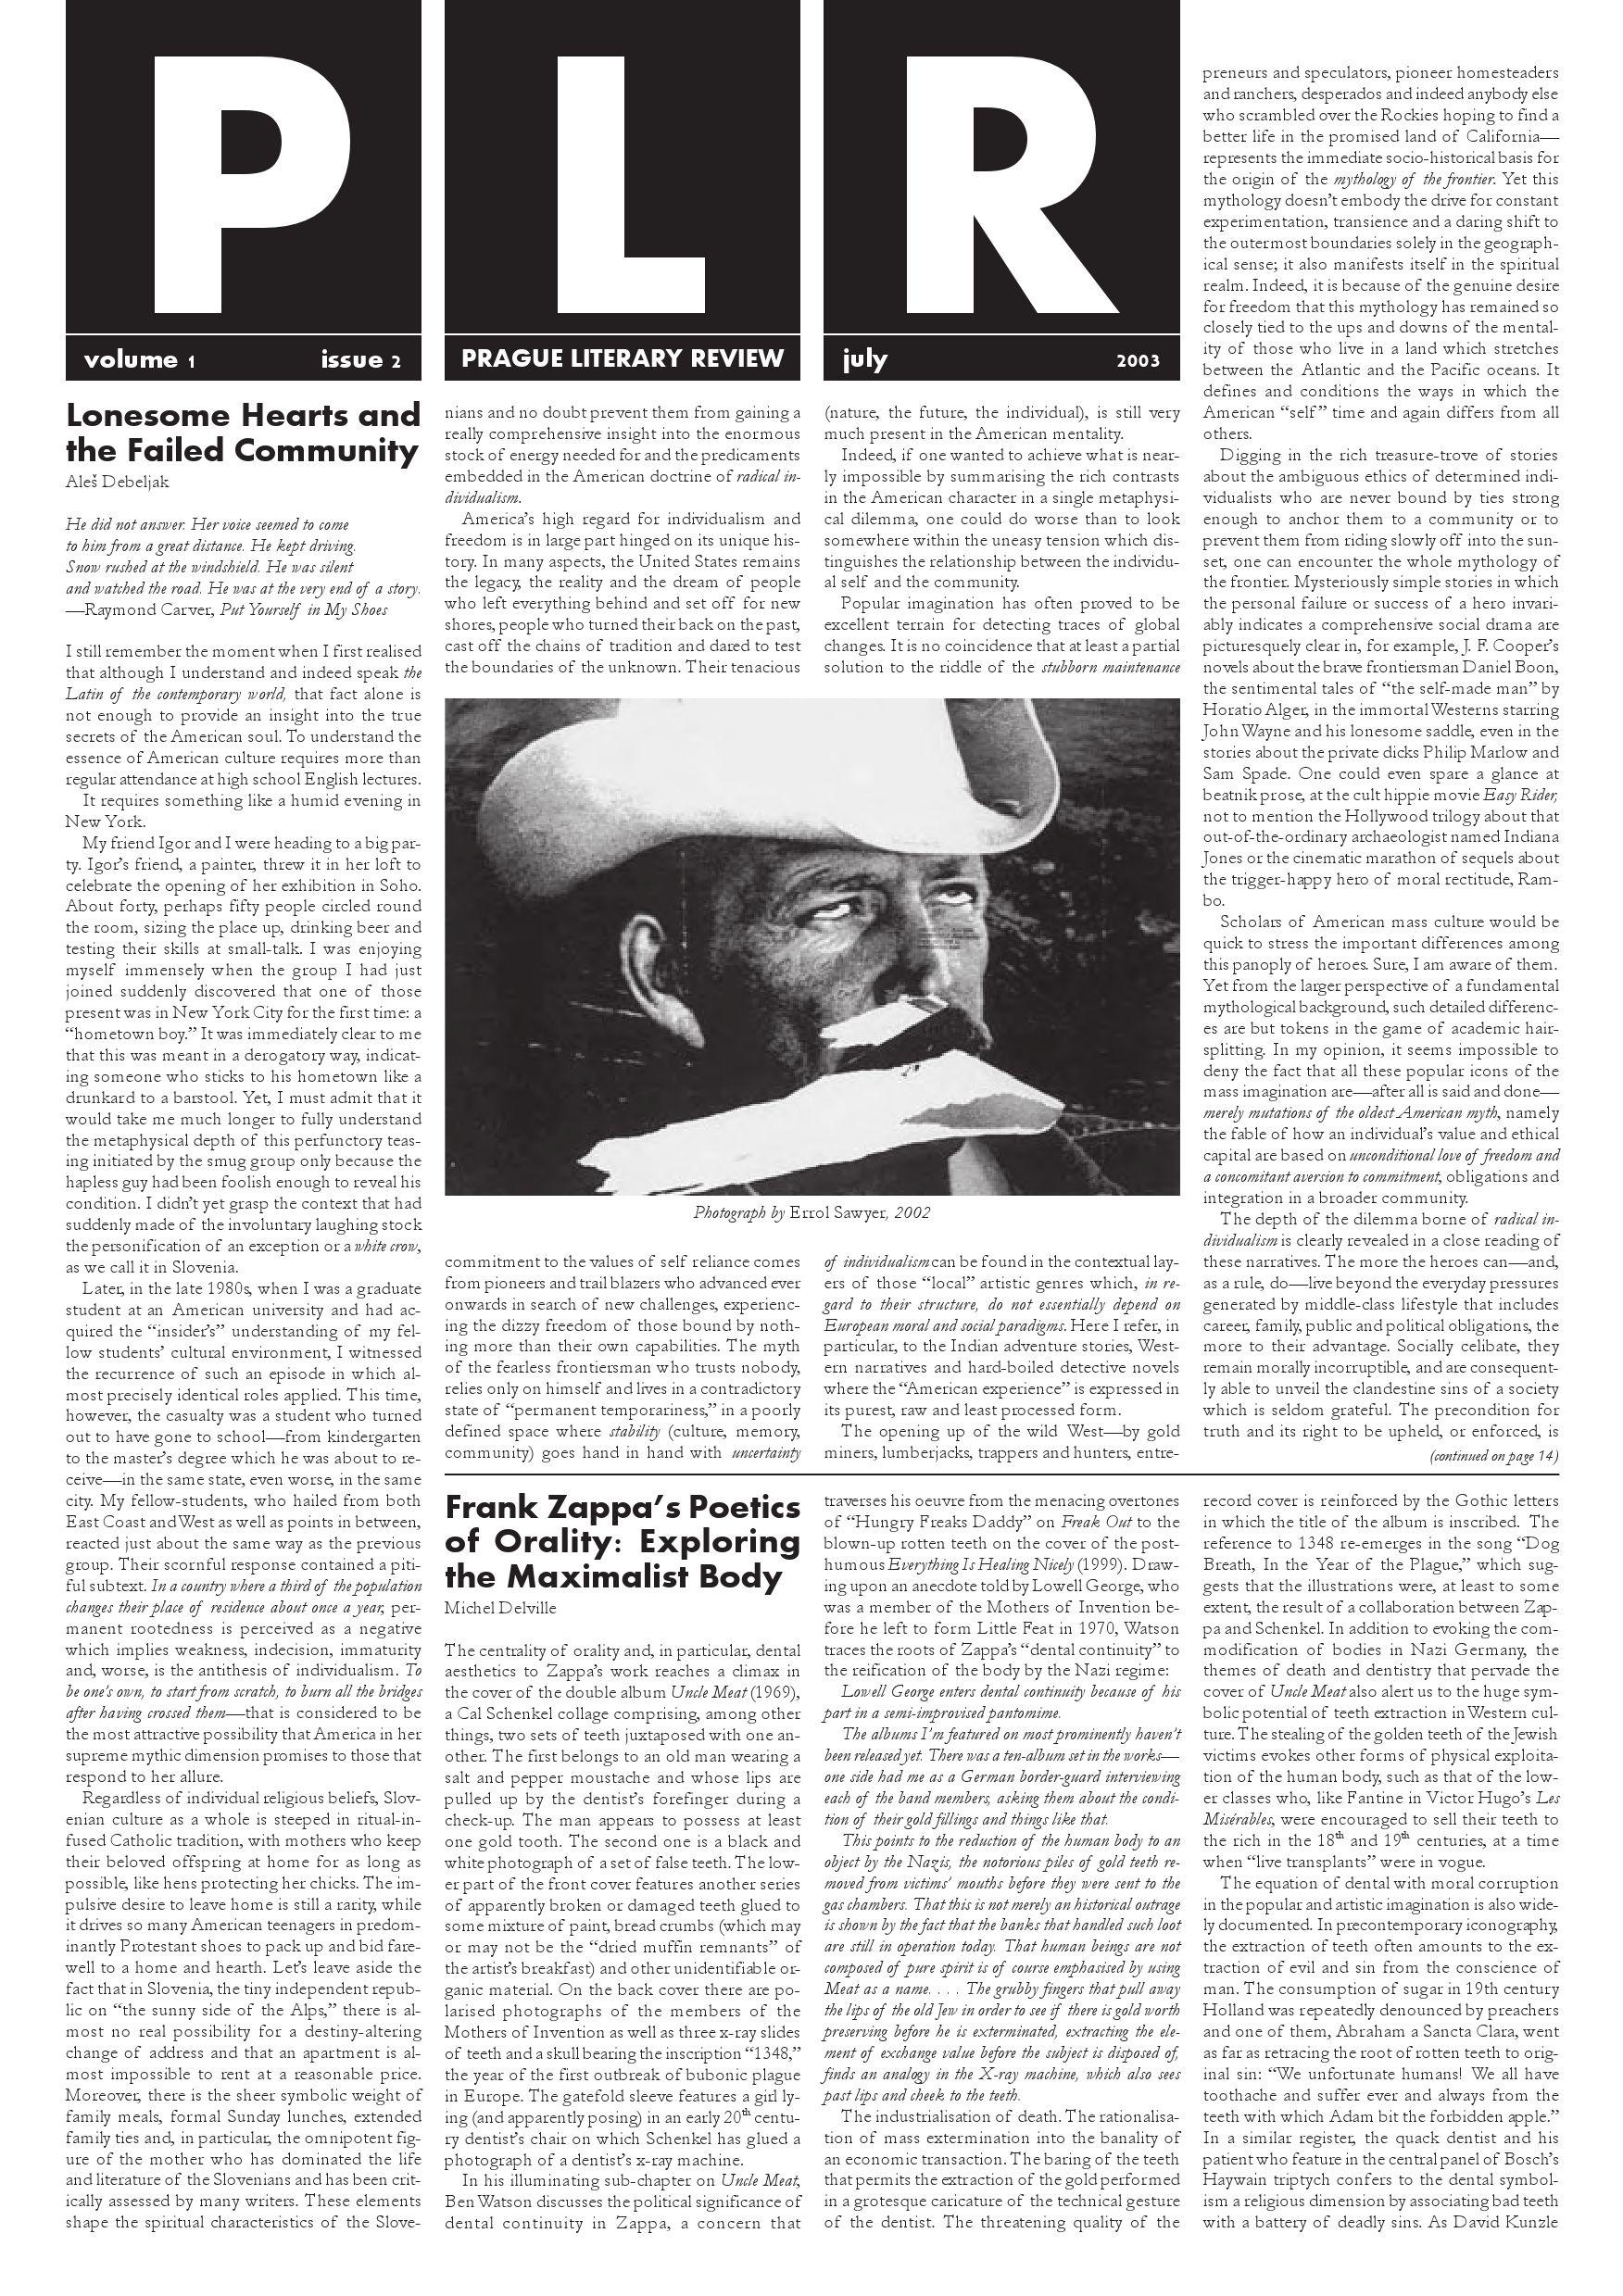 Plr vol 1 no 2 july 2003 by litteraria pragensia issuu